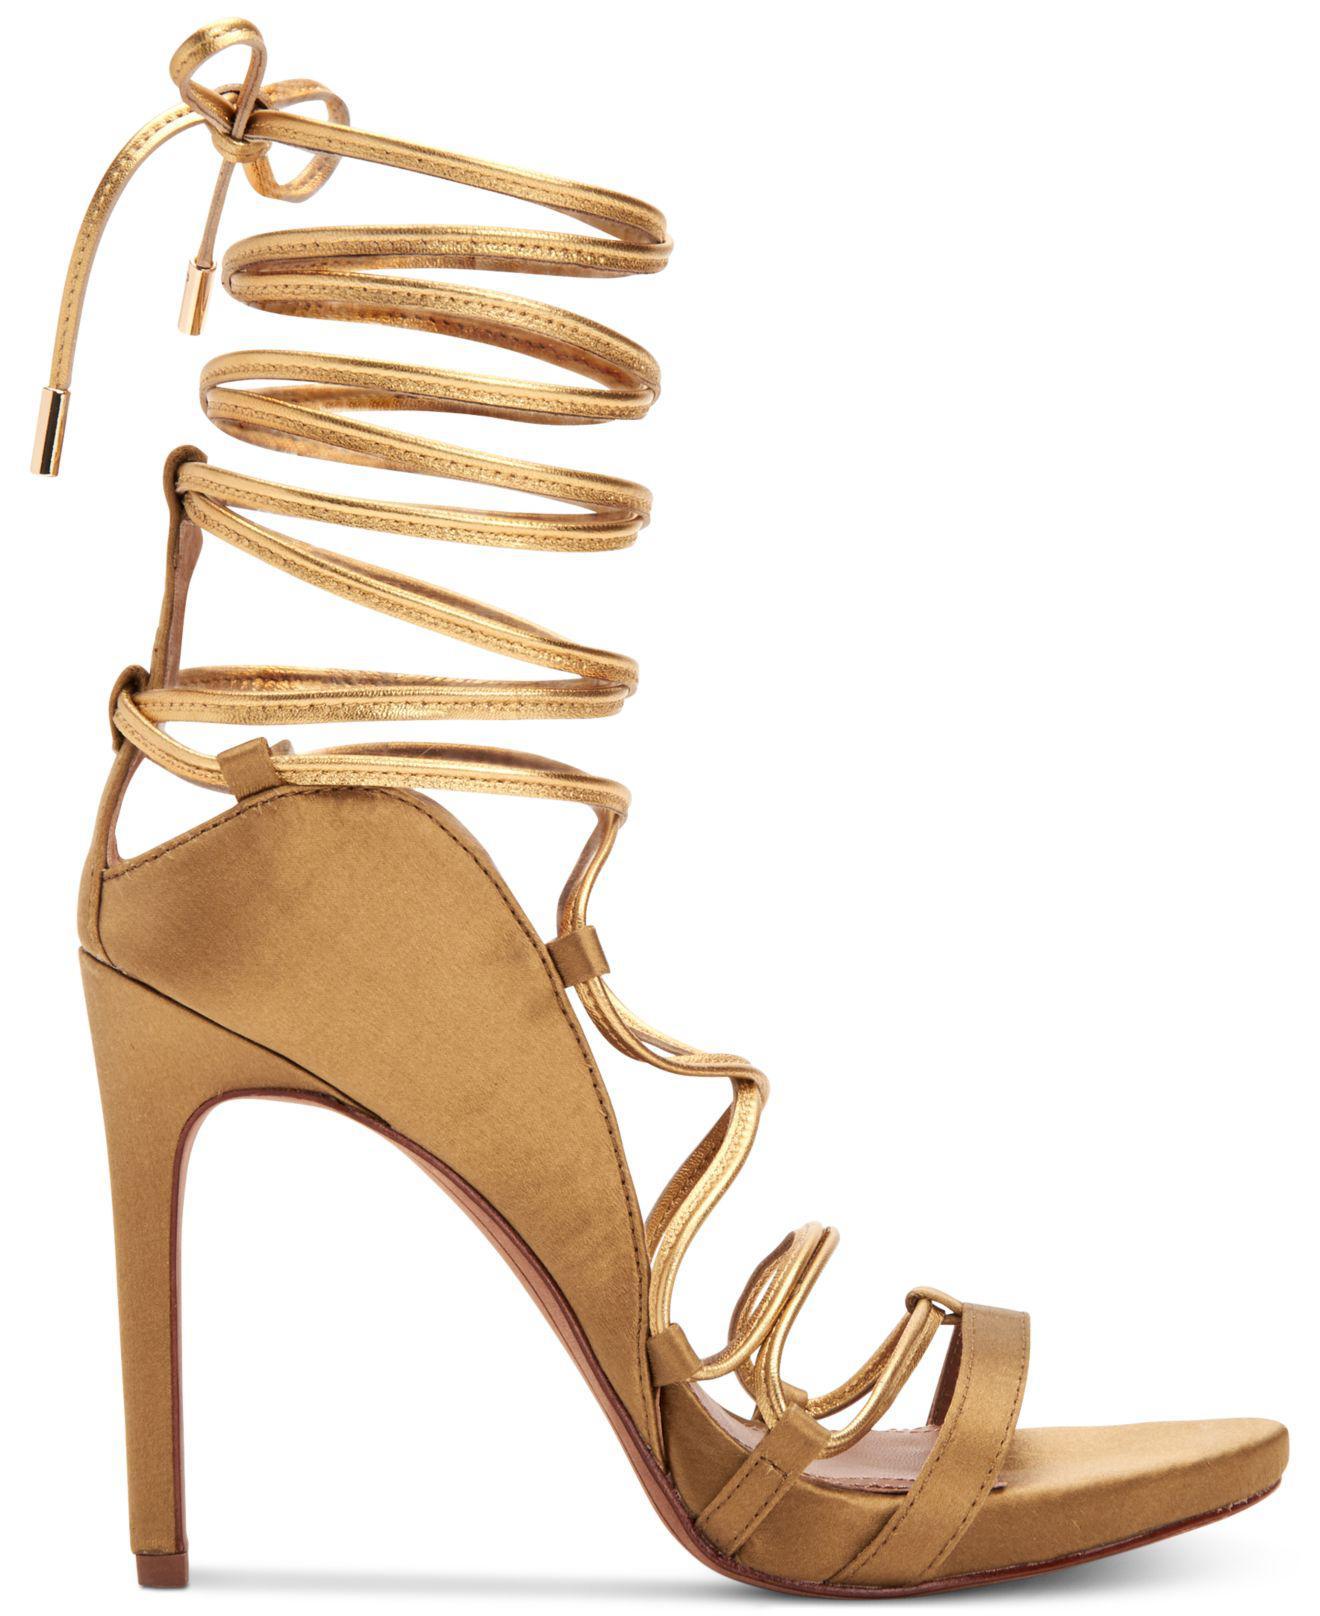 e9f31354eef Lyst - BCBGMAXAZRIA Esme Strappy Dress Sandals in Metallic - Save 22%